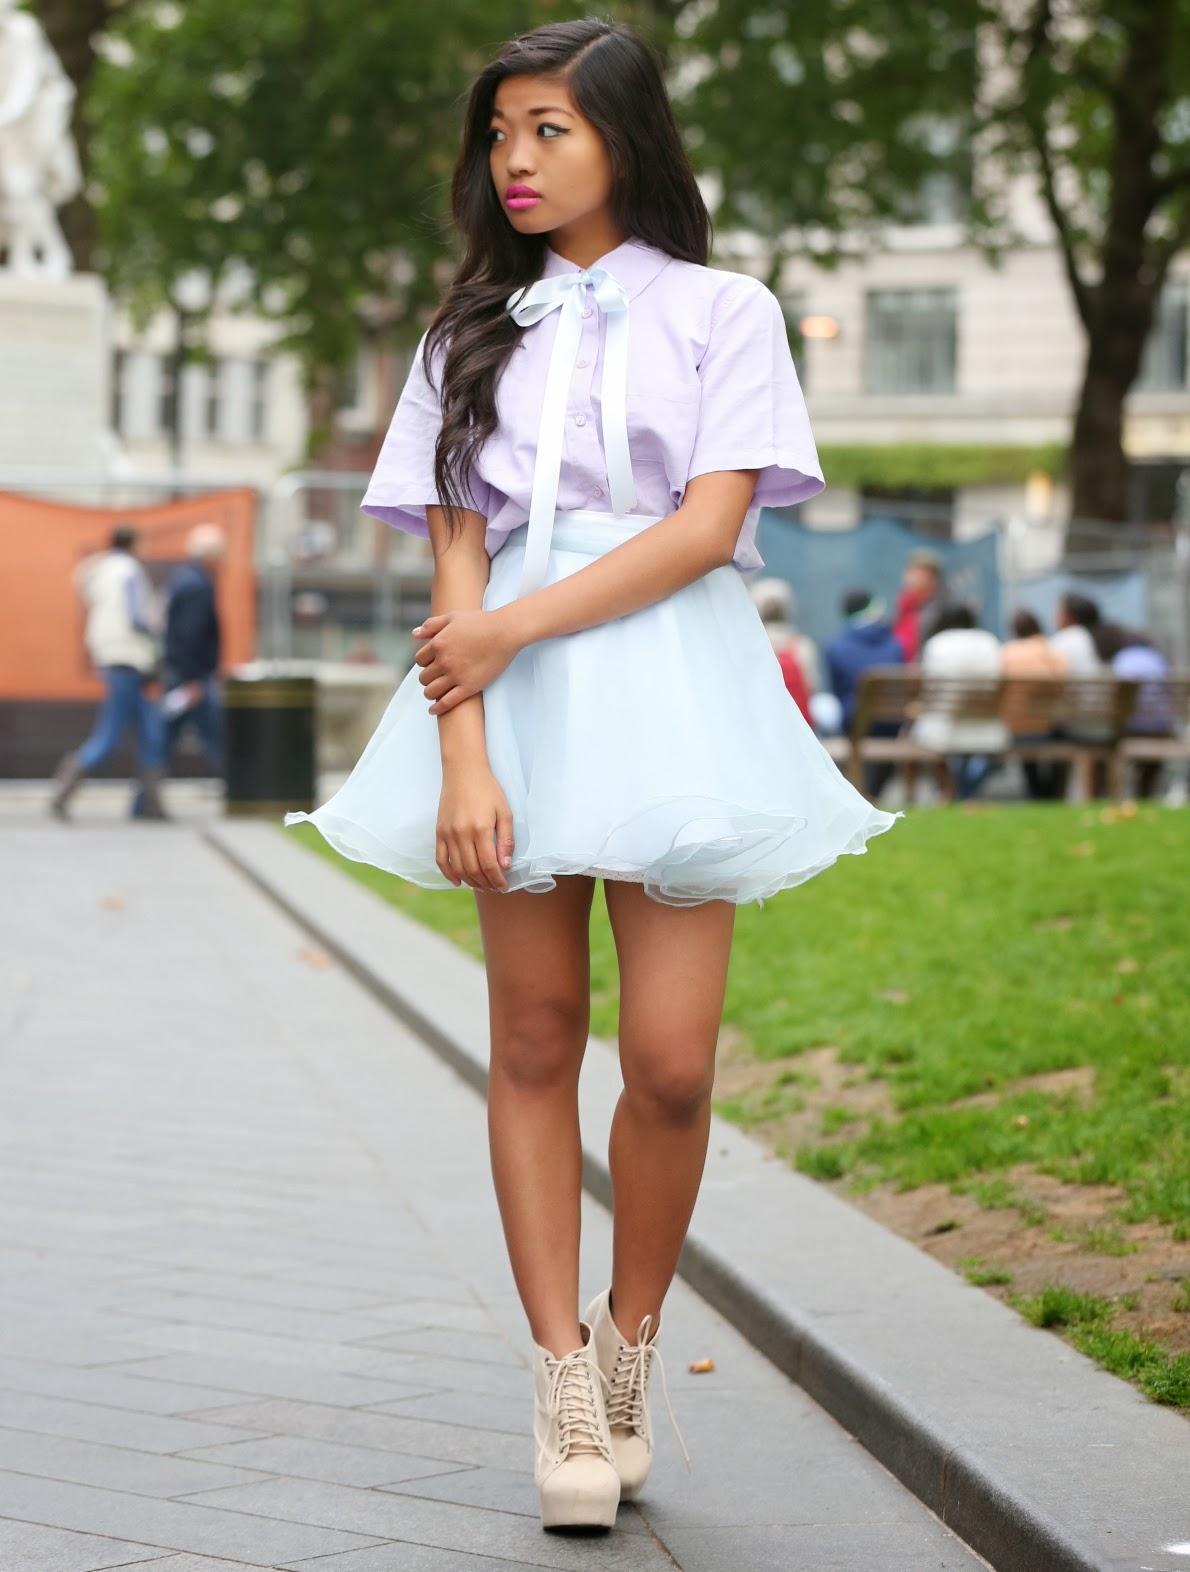 Anvil 880 Ladies 4.5 oz. Ringspun Cotton Fashion Fit T-Shirt 43